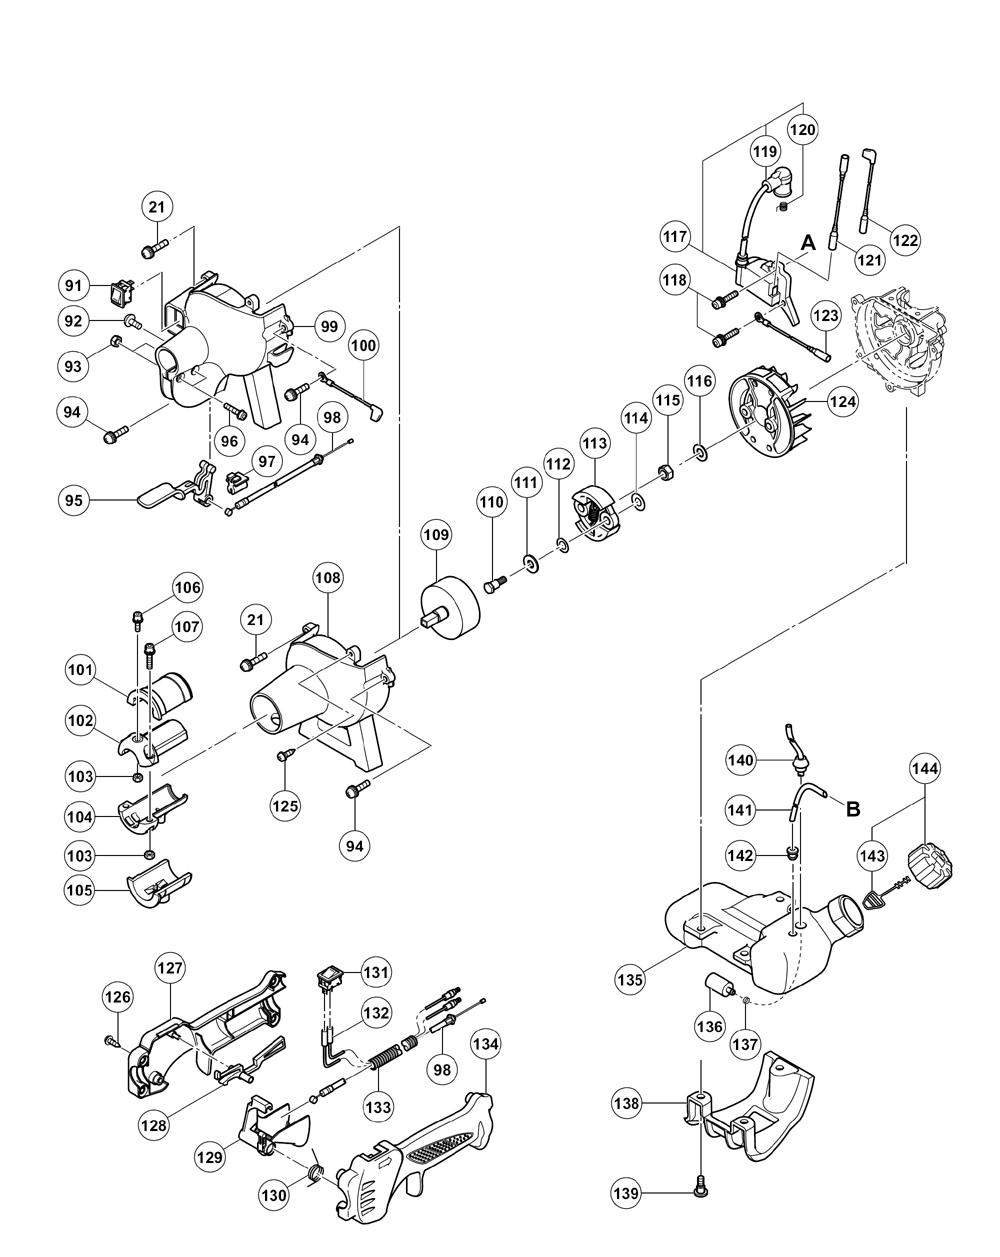 Hitachi-CG22EABSLP-Parts-2339-PBBreak Down